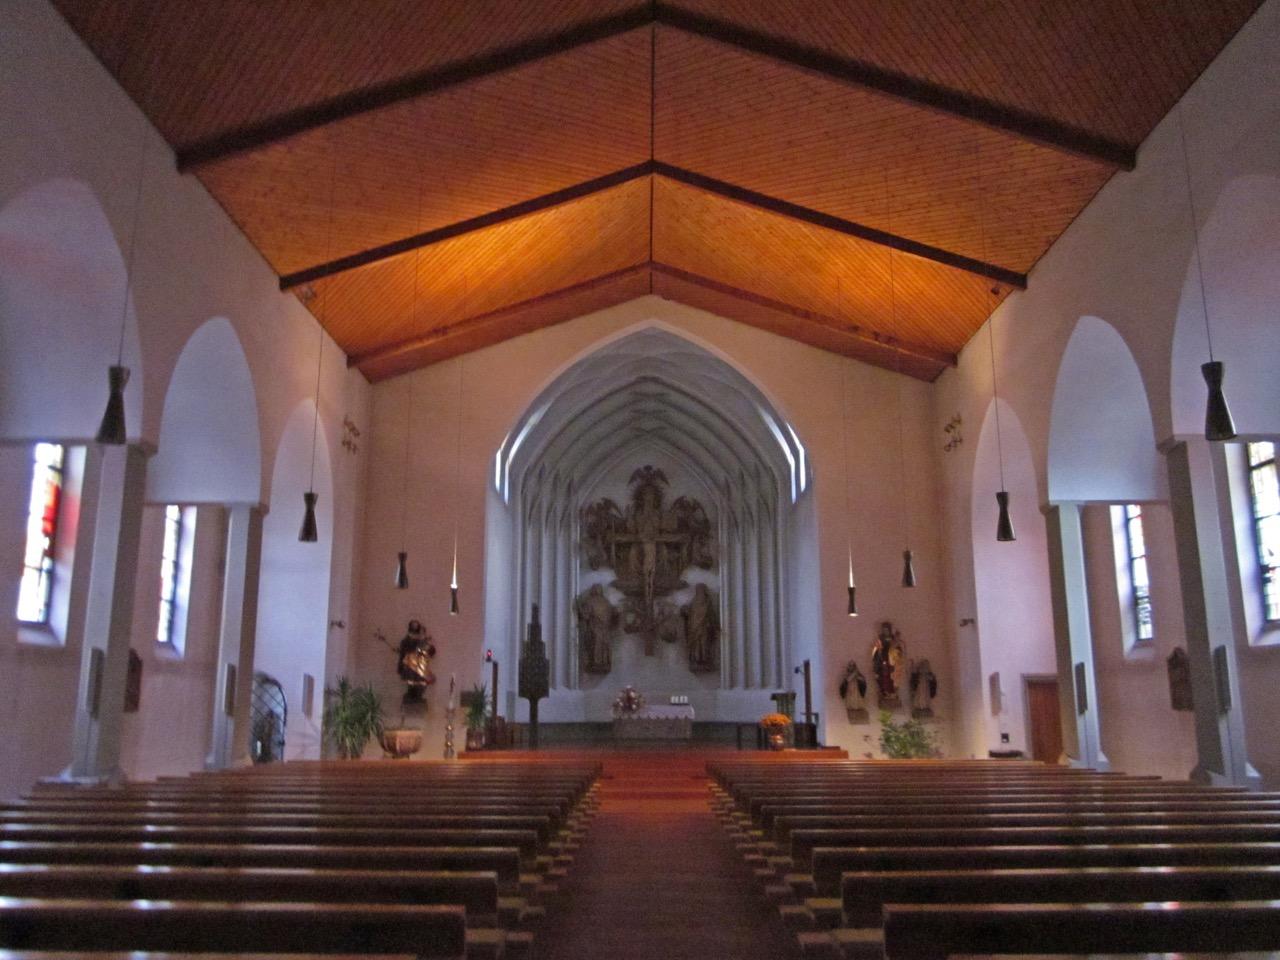 Moderne Kirche, Innenansicht